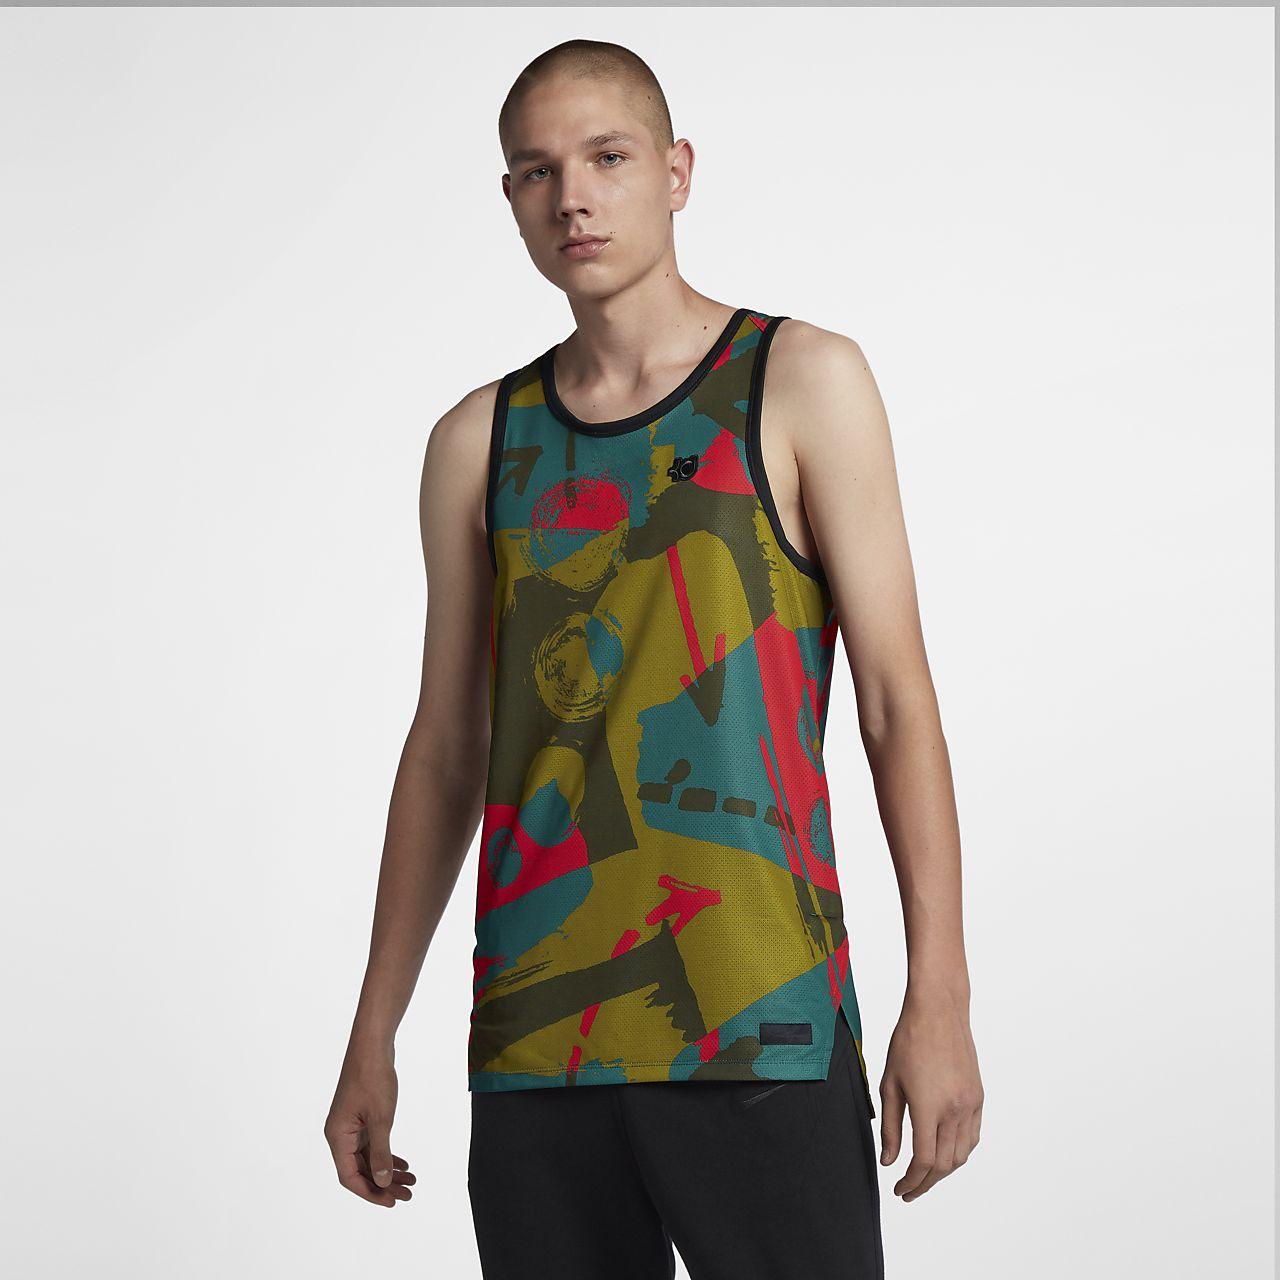 Nike KD Hyper Elite Men's Basketball Tank